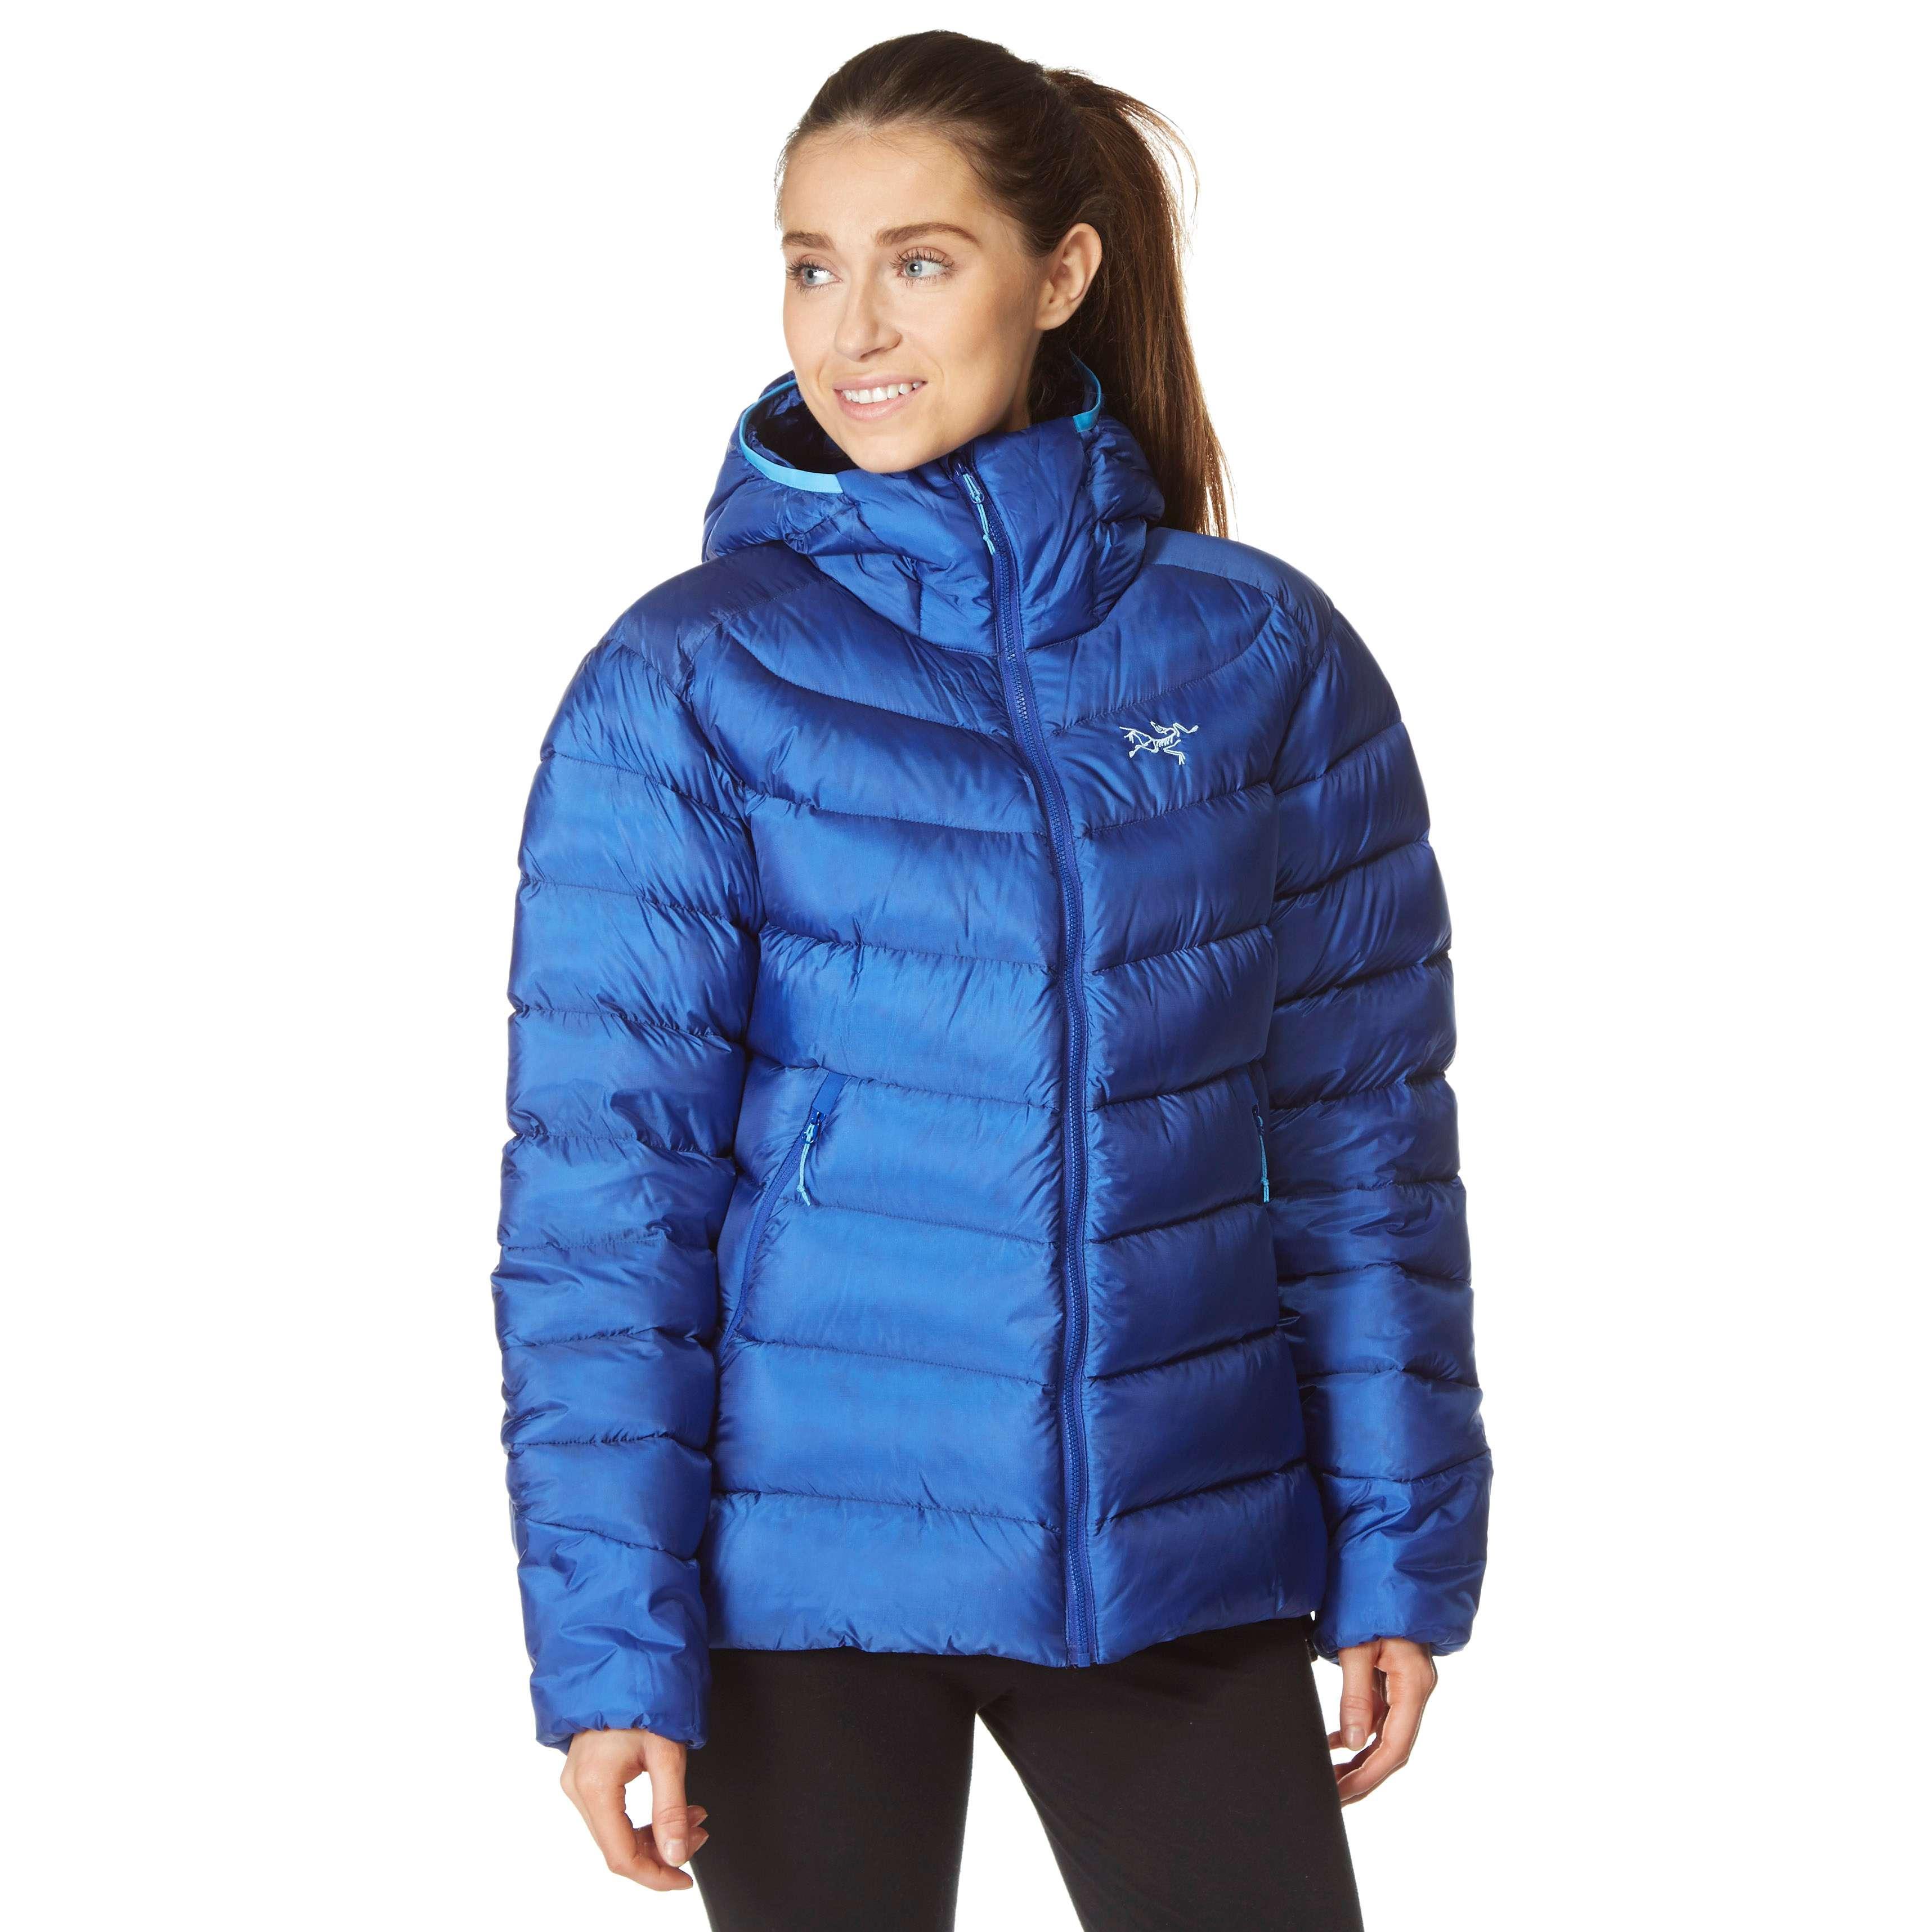 ARC'TERYX Women's Cerium SV Hooded Jacket